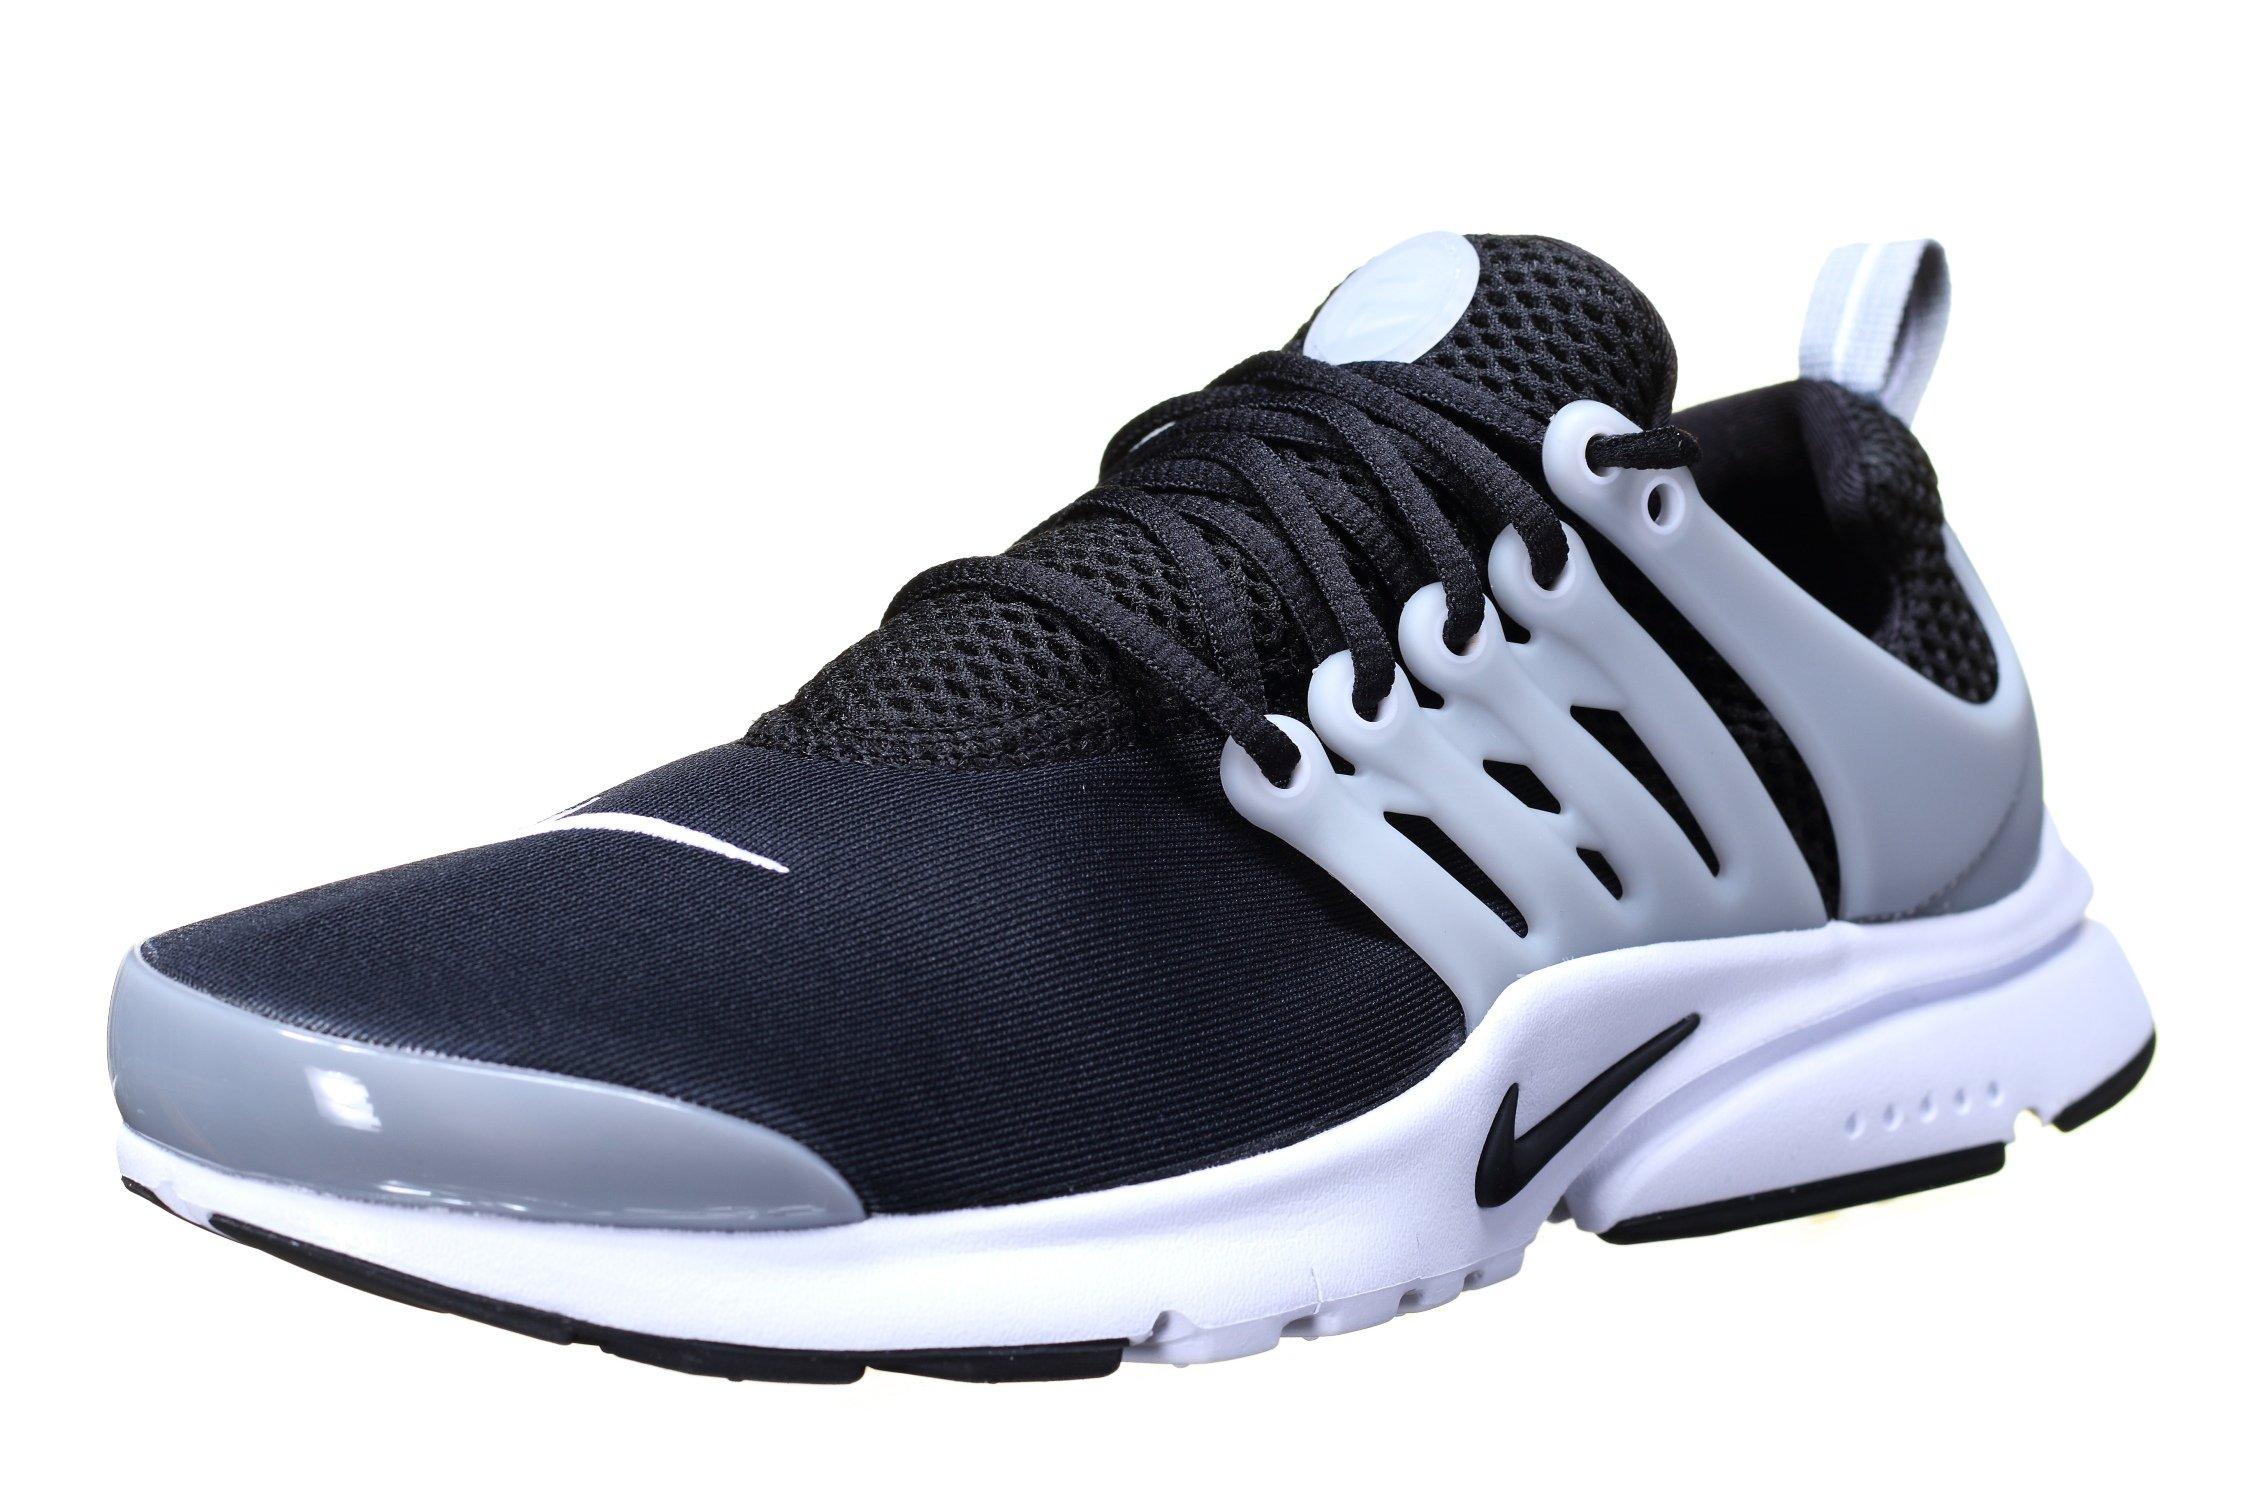 Nike Kids Presto (gs), BLACK/BLACK-WHITE-WOLF GREY, Youth Size 7 by NIKE